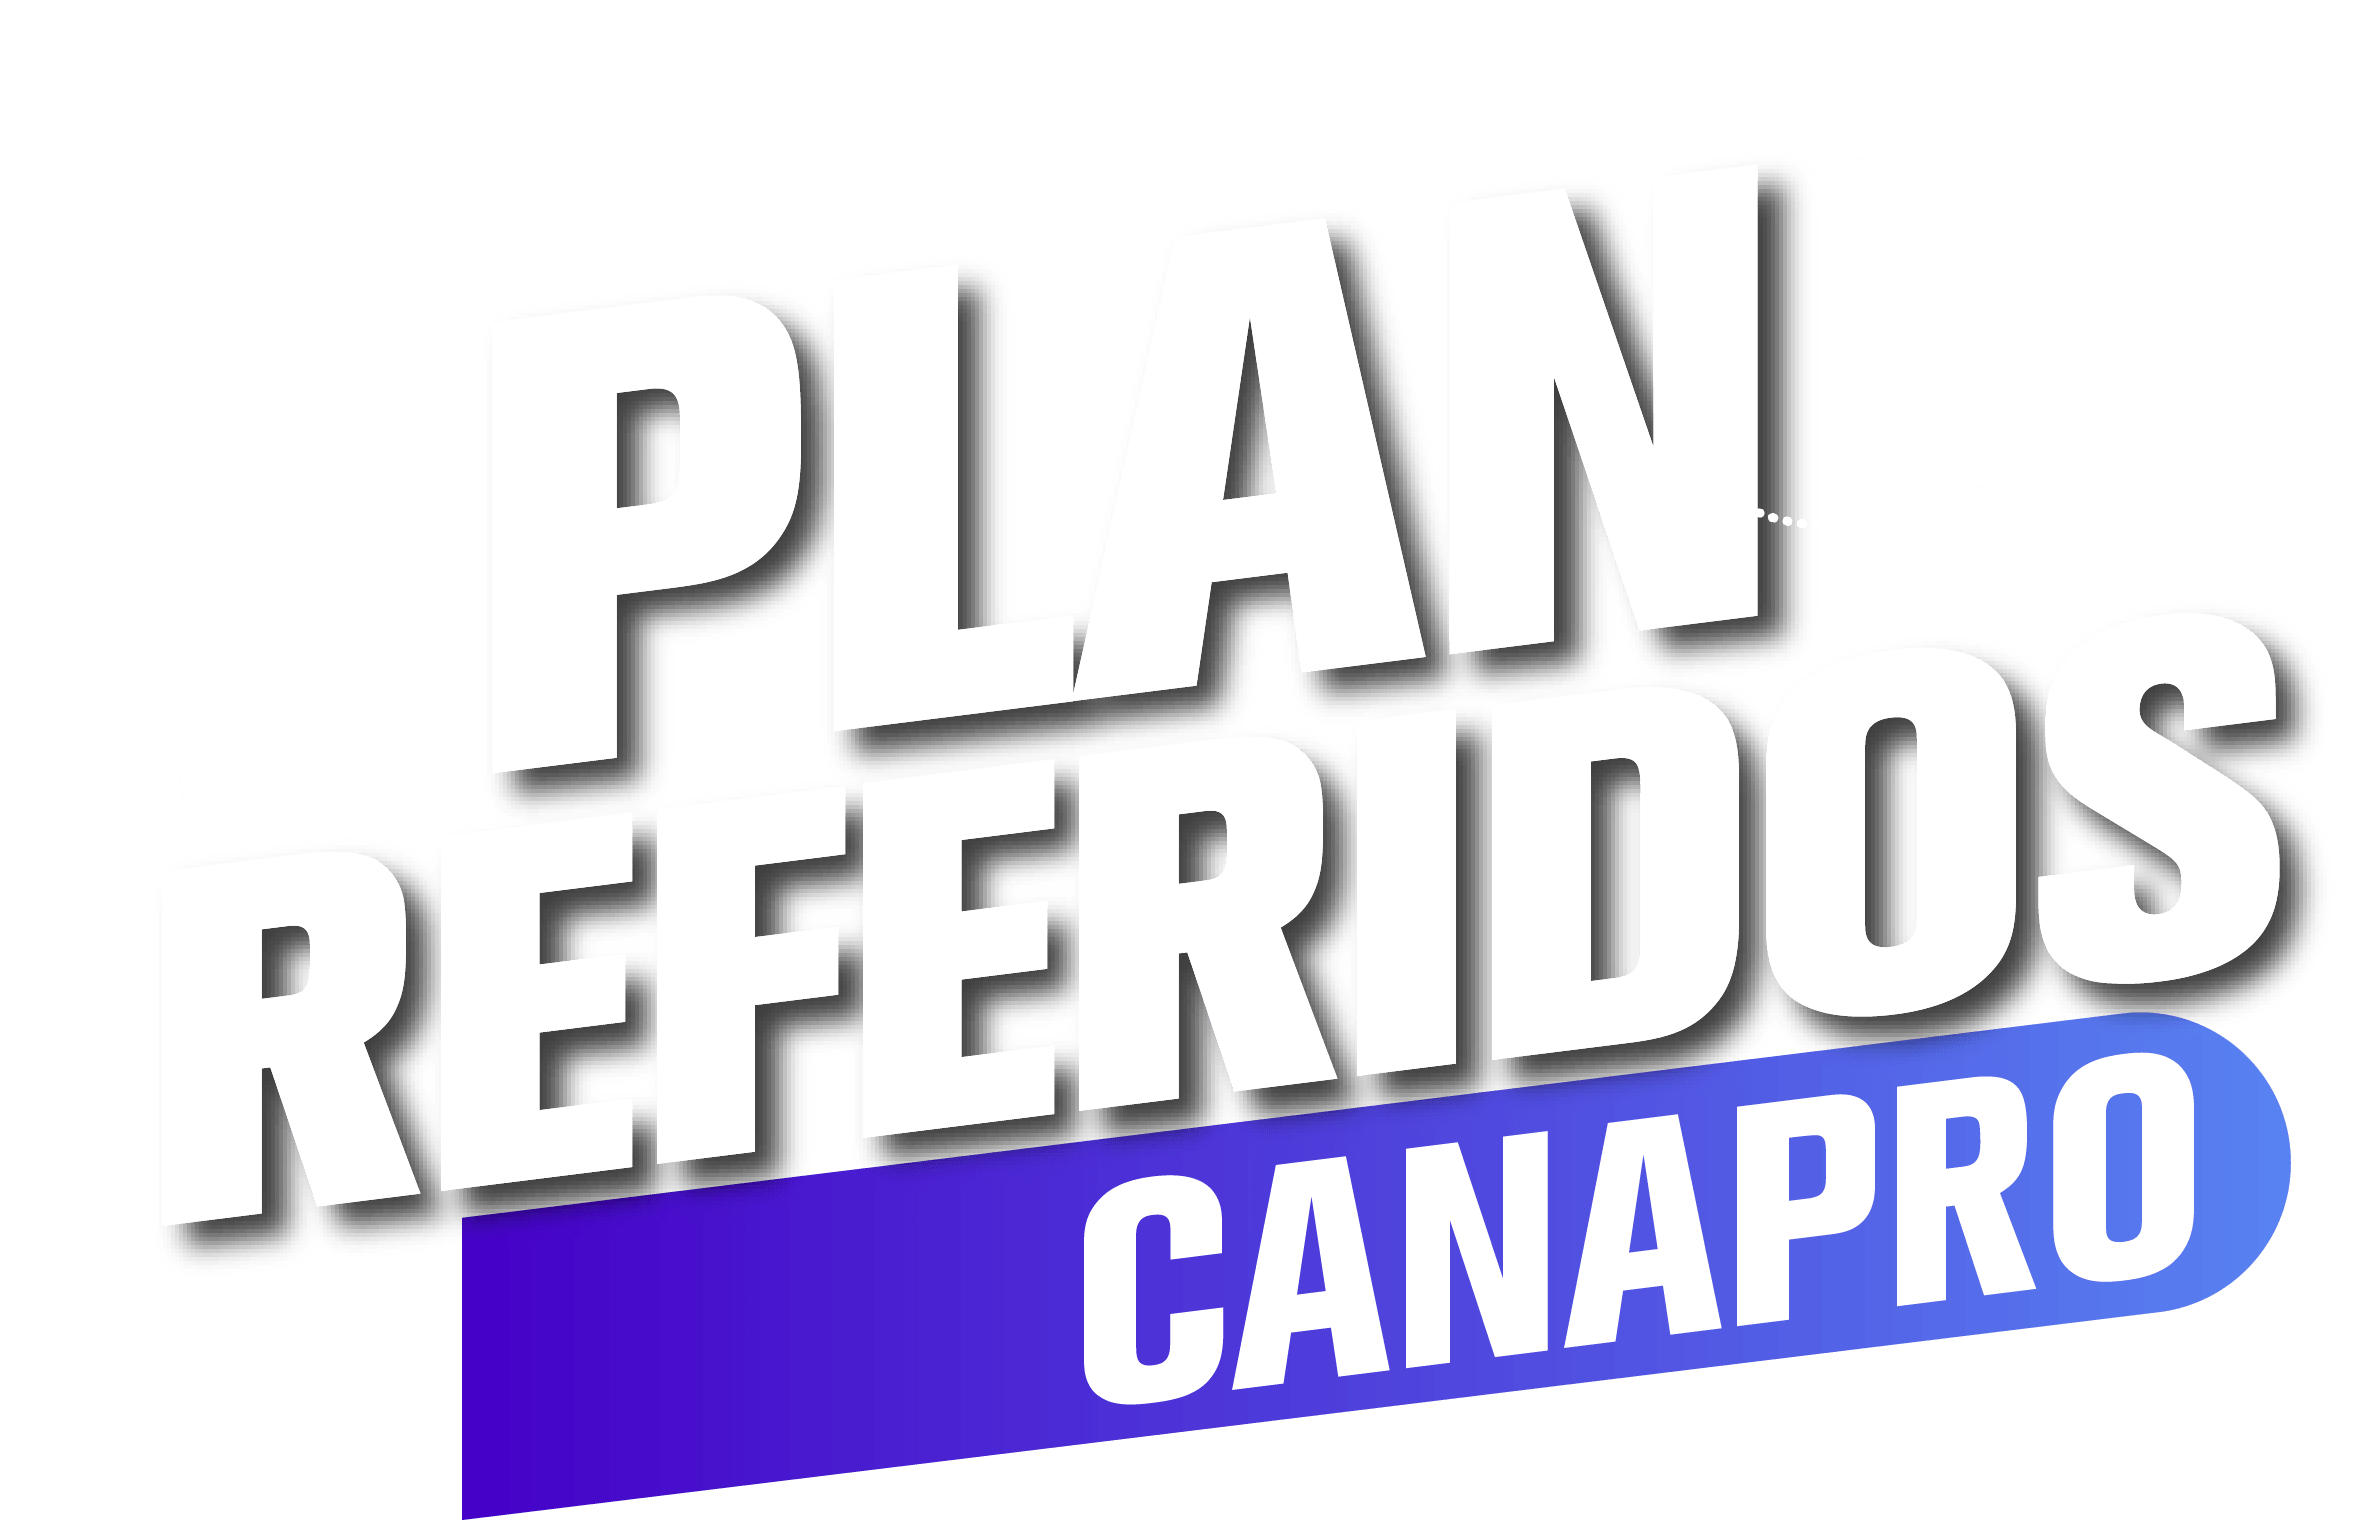 Plan referidos canapro